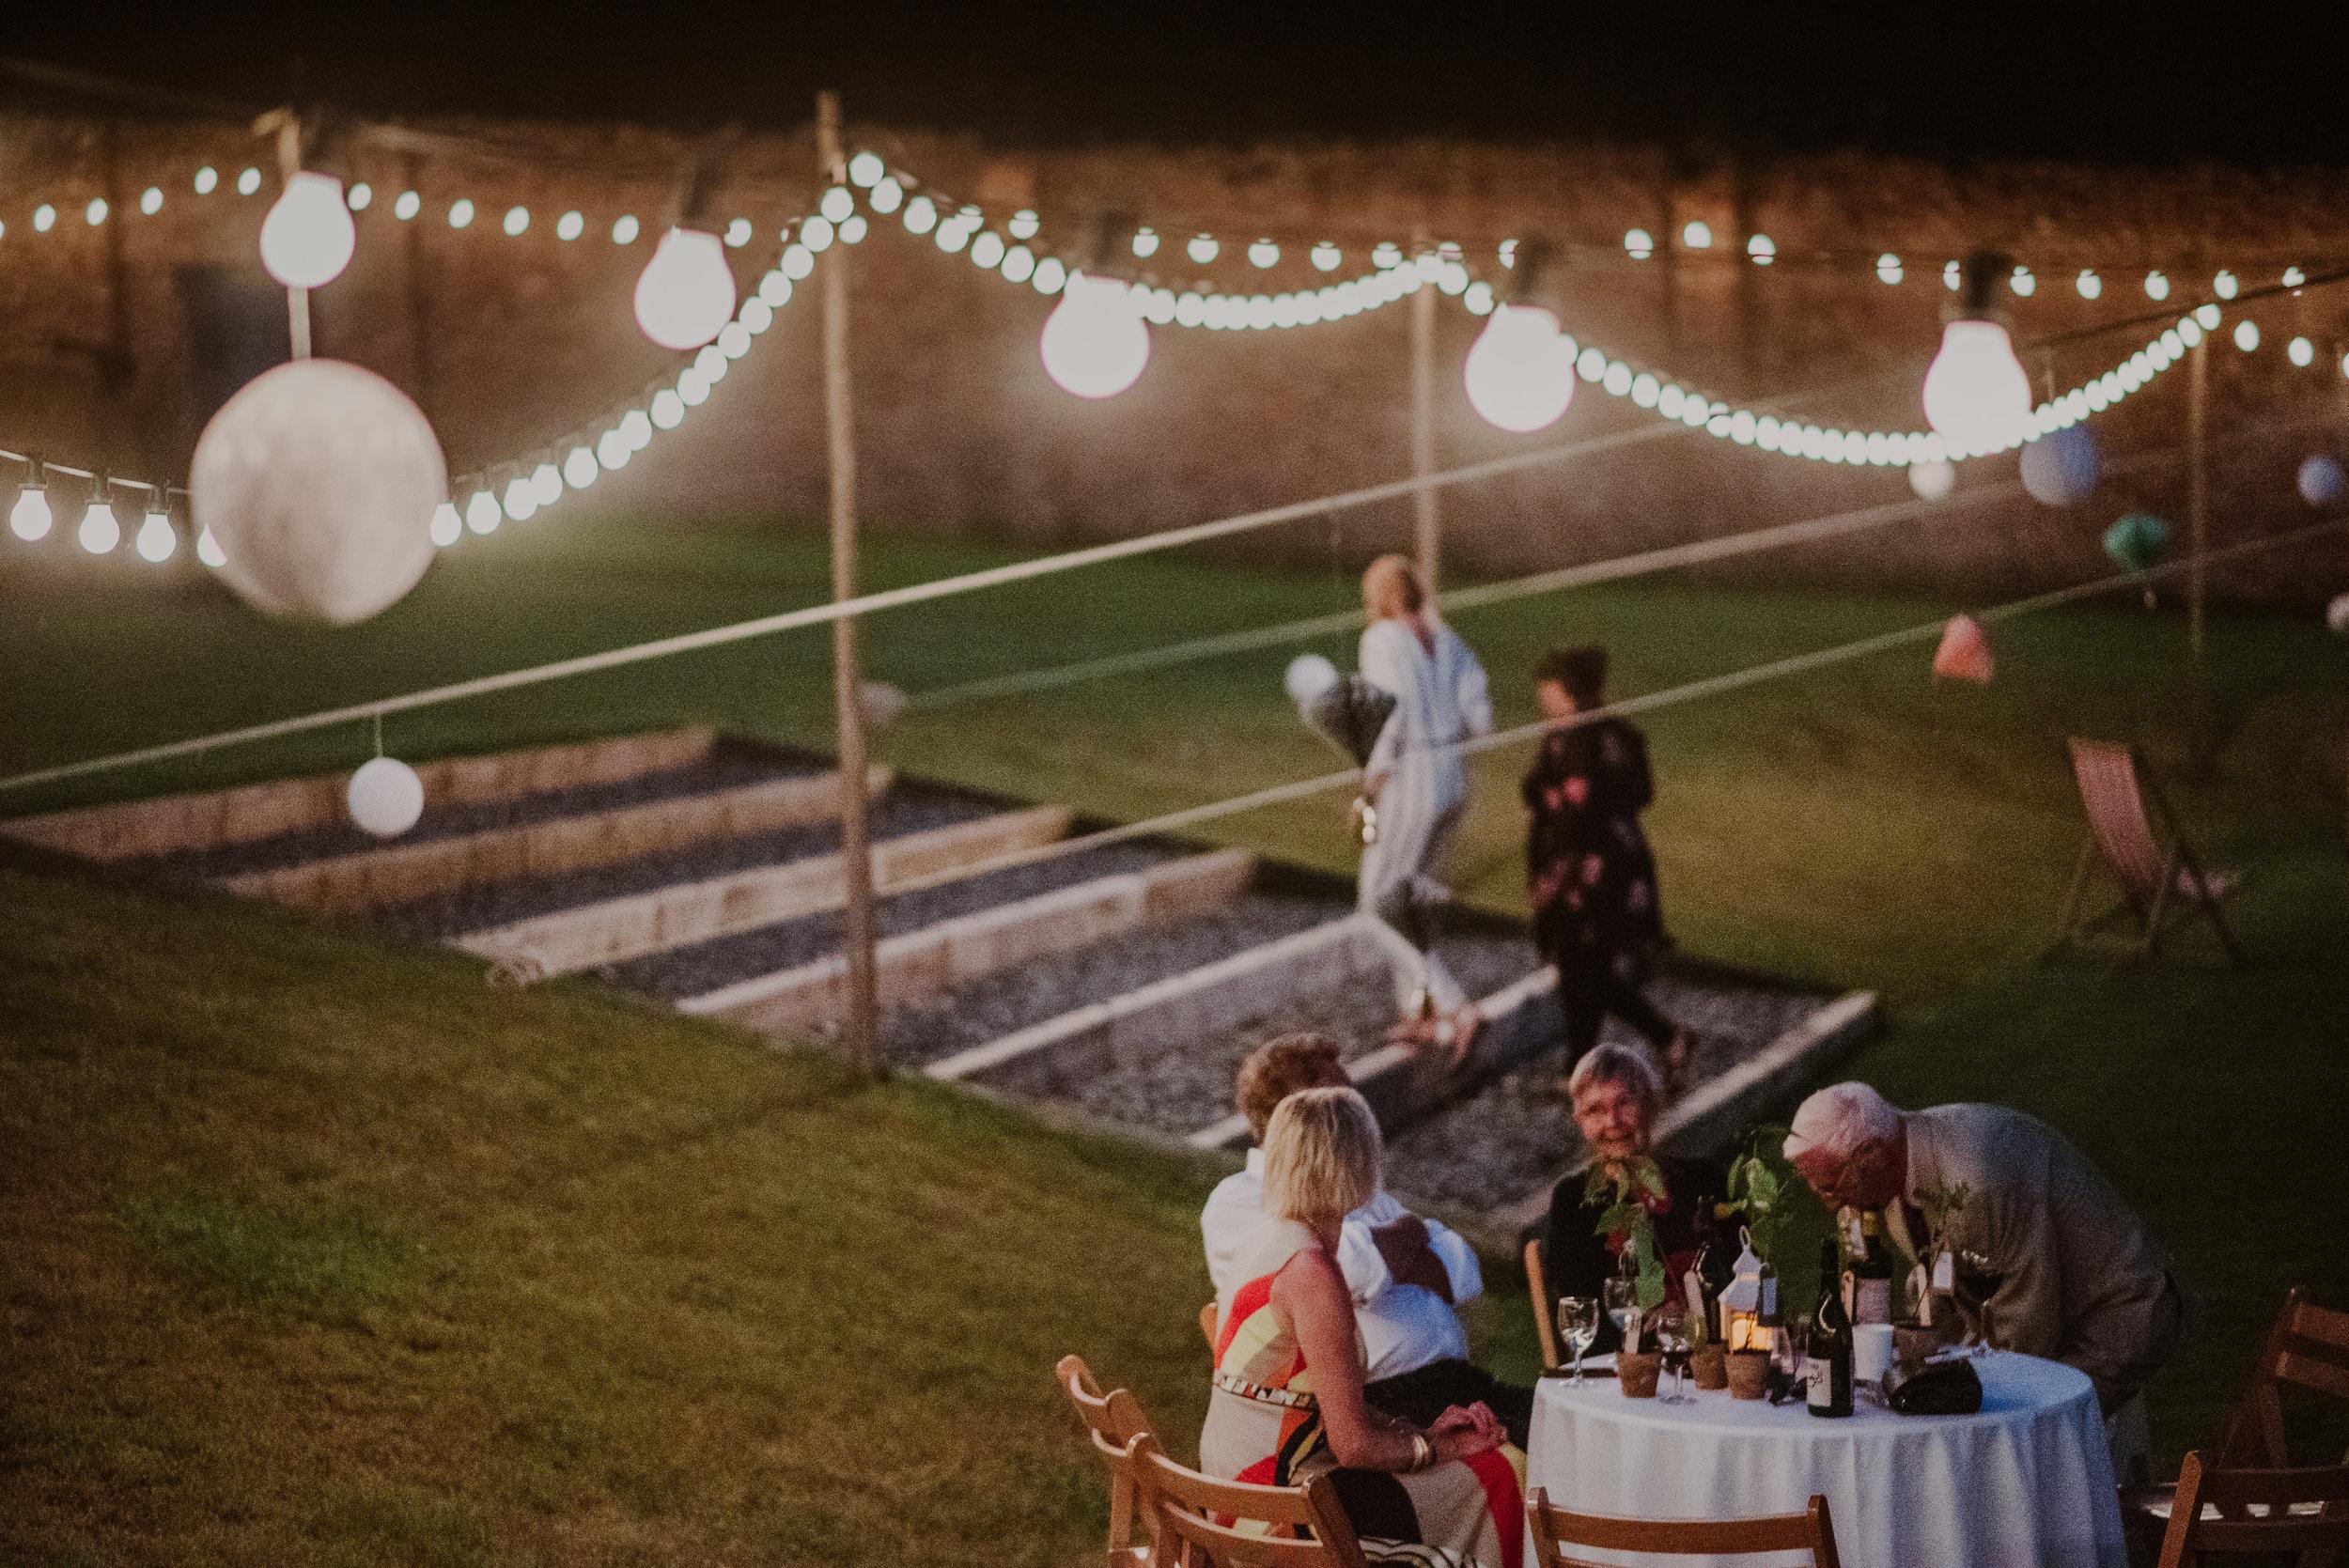 pencarrow-house-wedding-photographer-151.jpg